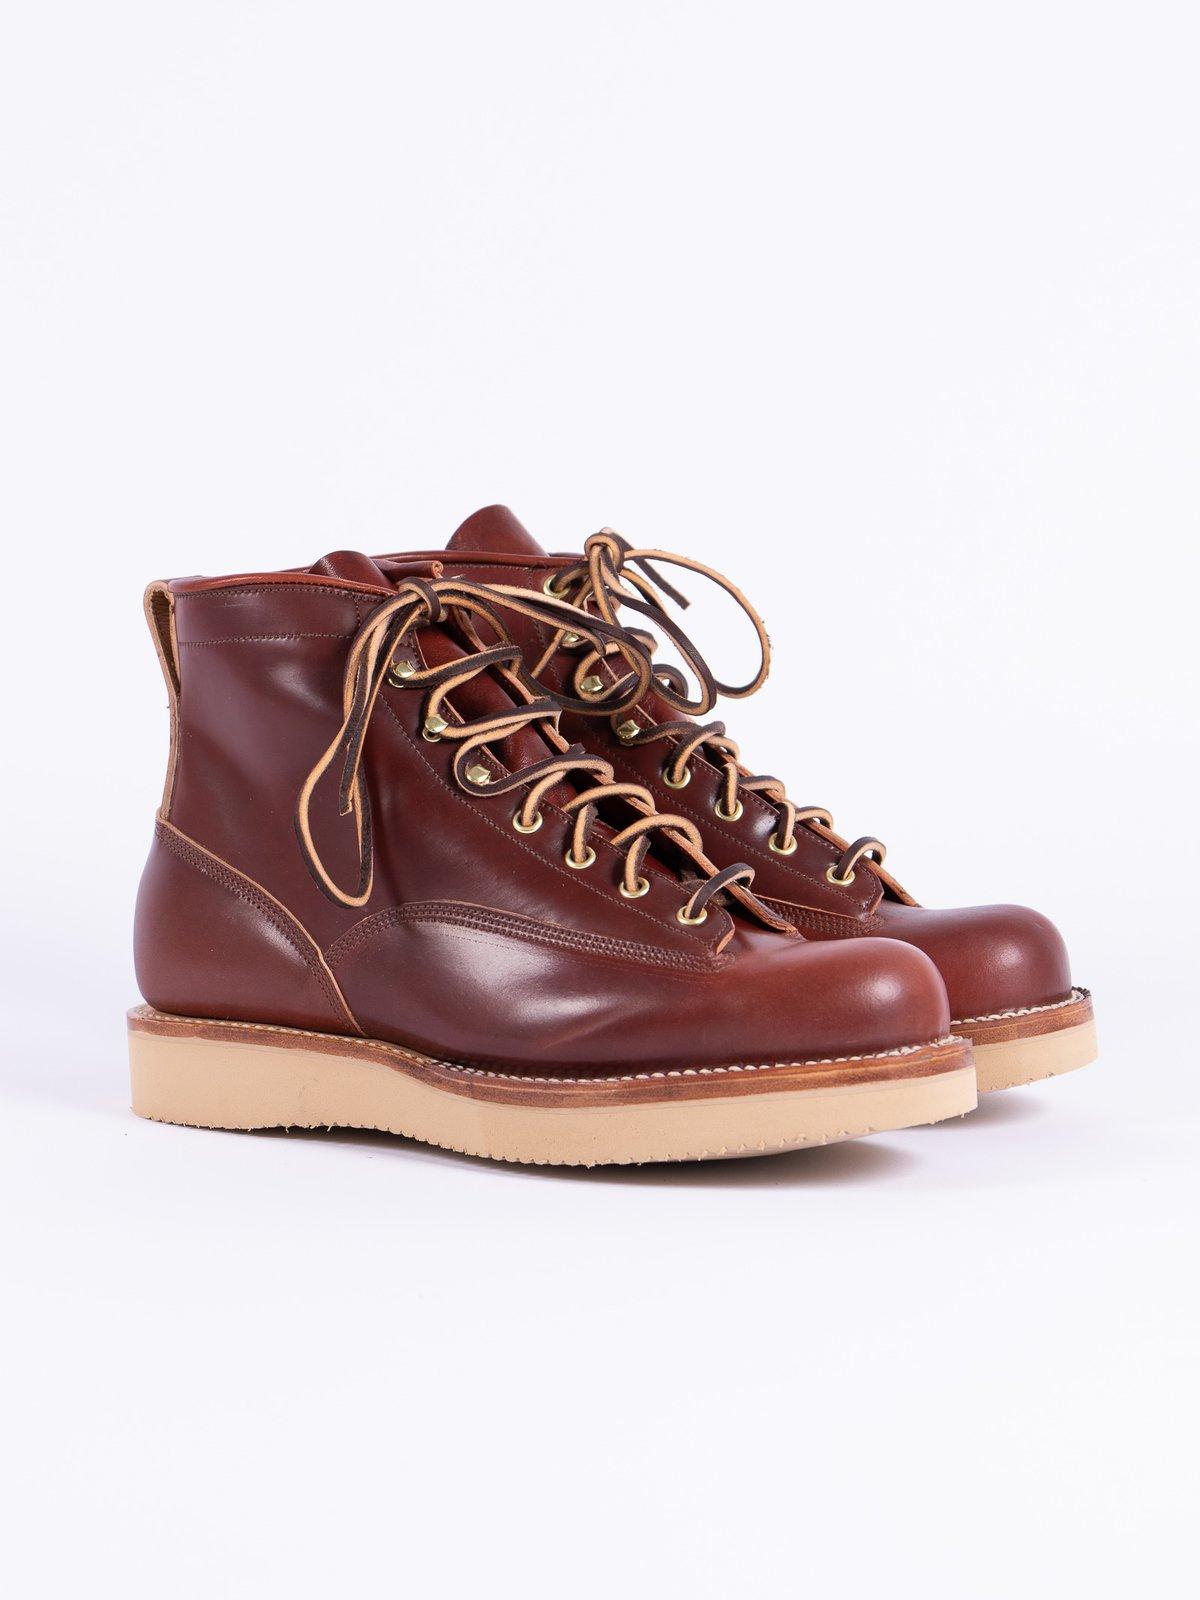 Garnet Shell Cordovan Rigger Boot - Image 1